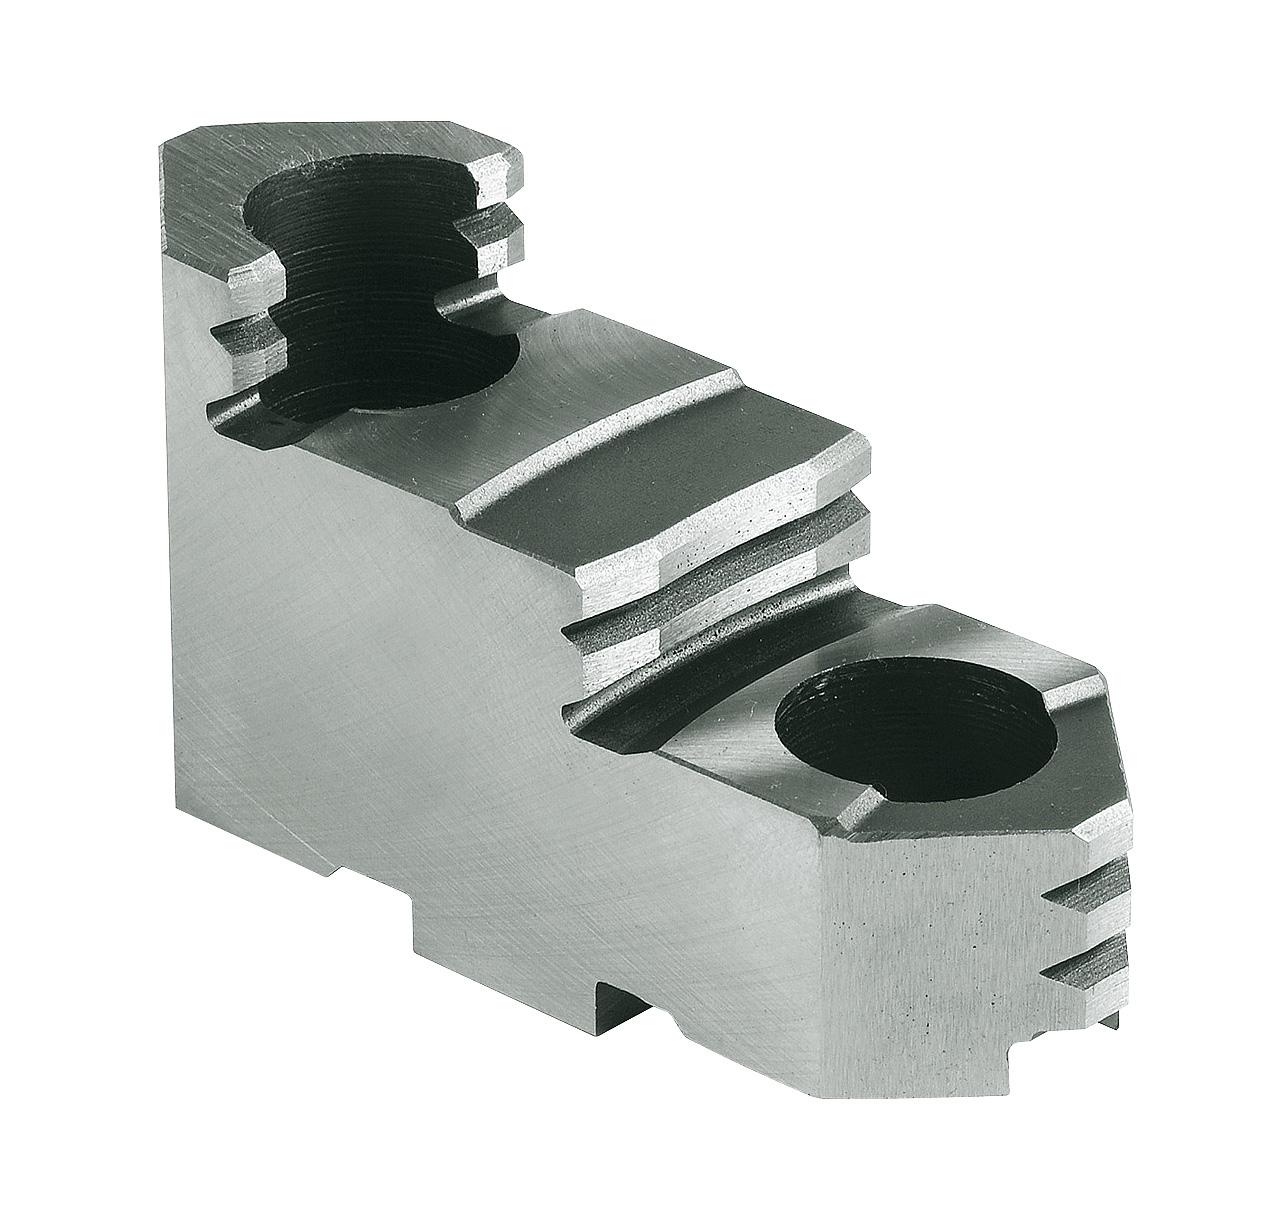 Szczęki górne twarde - komplet DTJ-DK12-315 BERNARDO